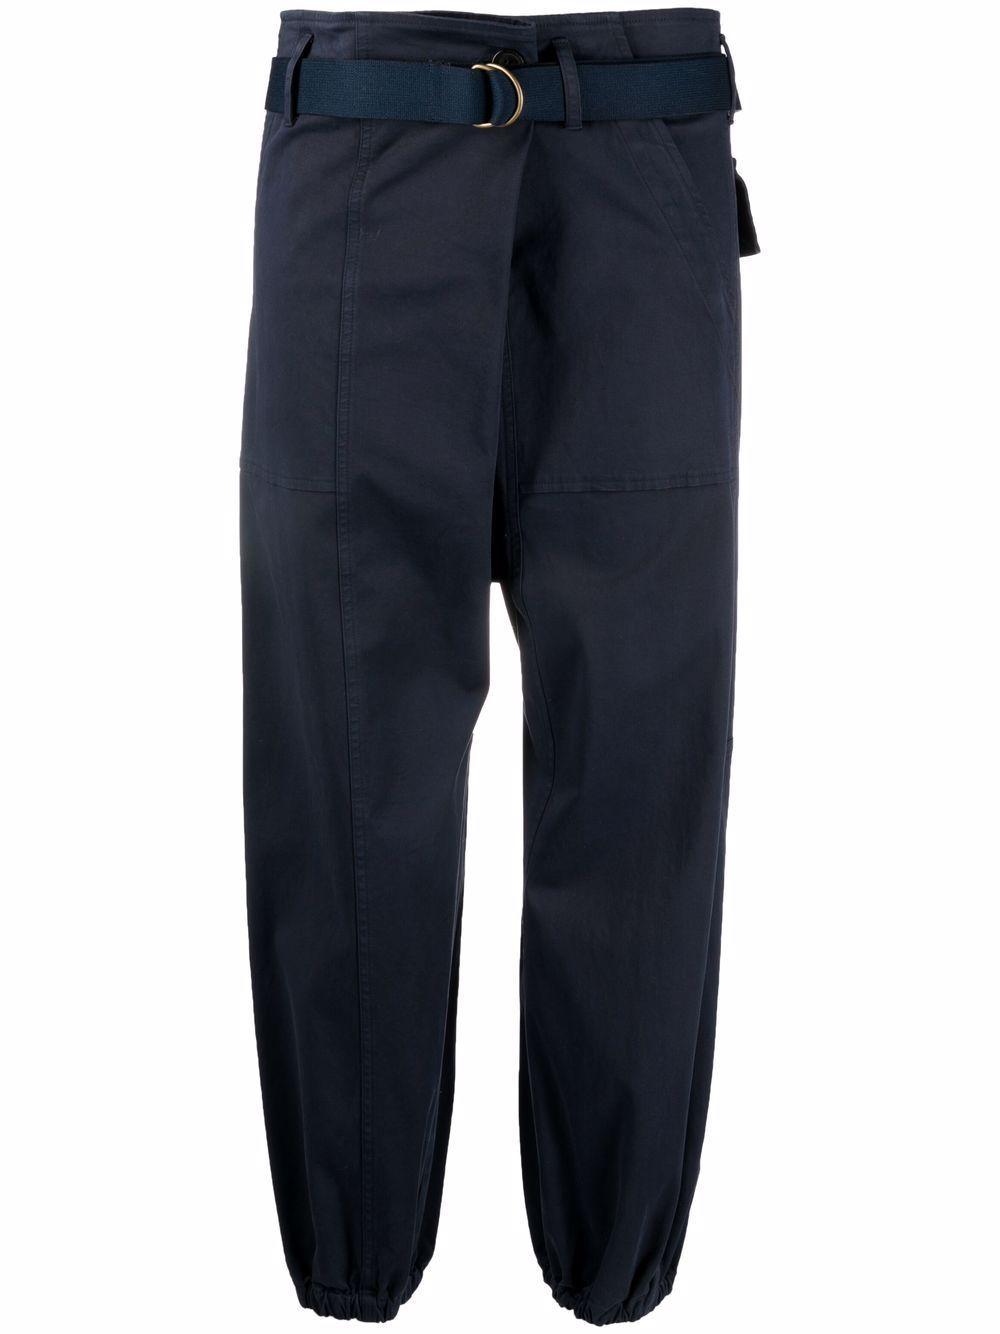 Pantalone agathe in cotone